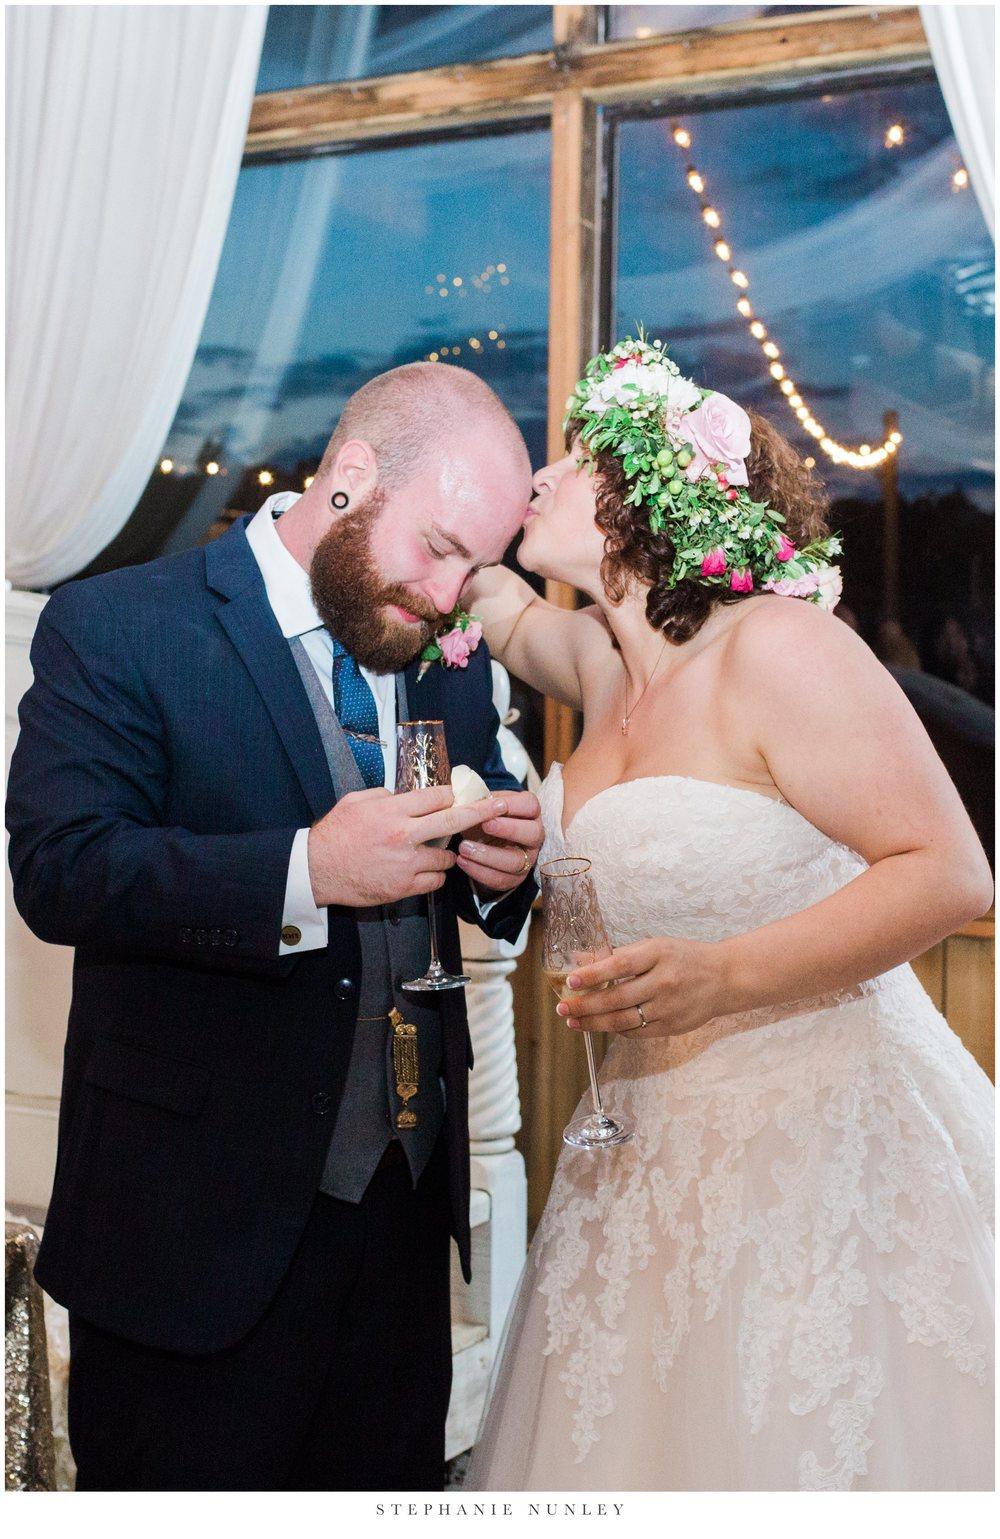 romantic-outdoor-wedding-with-flower-crown-0144.jpg